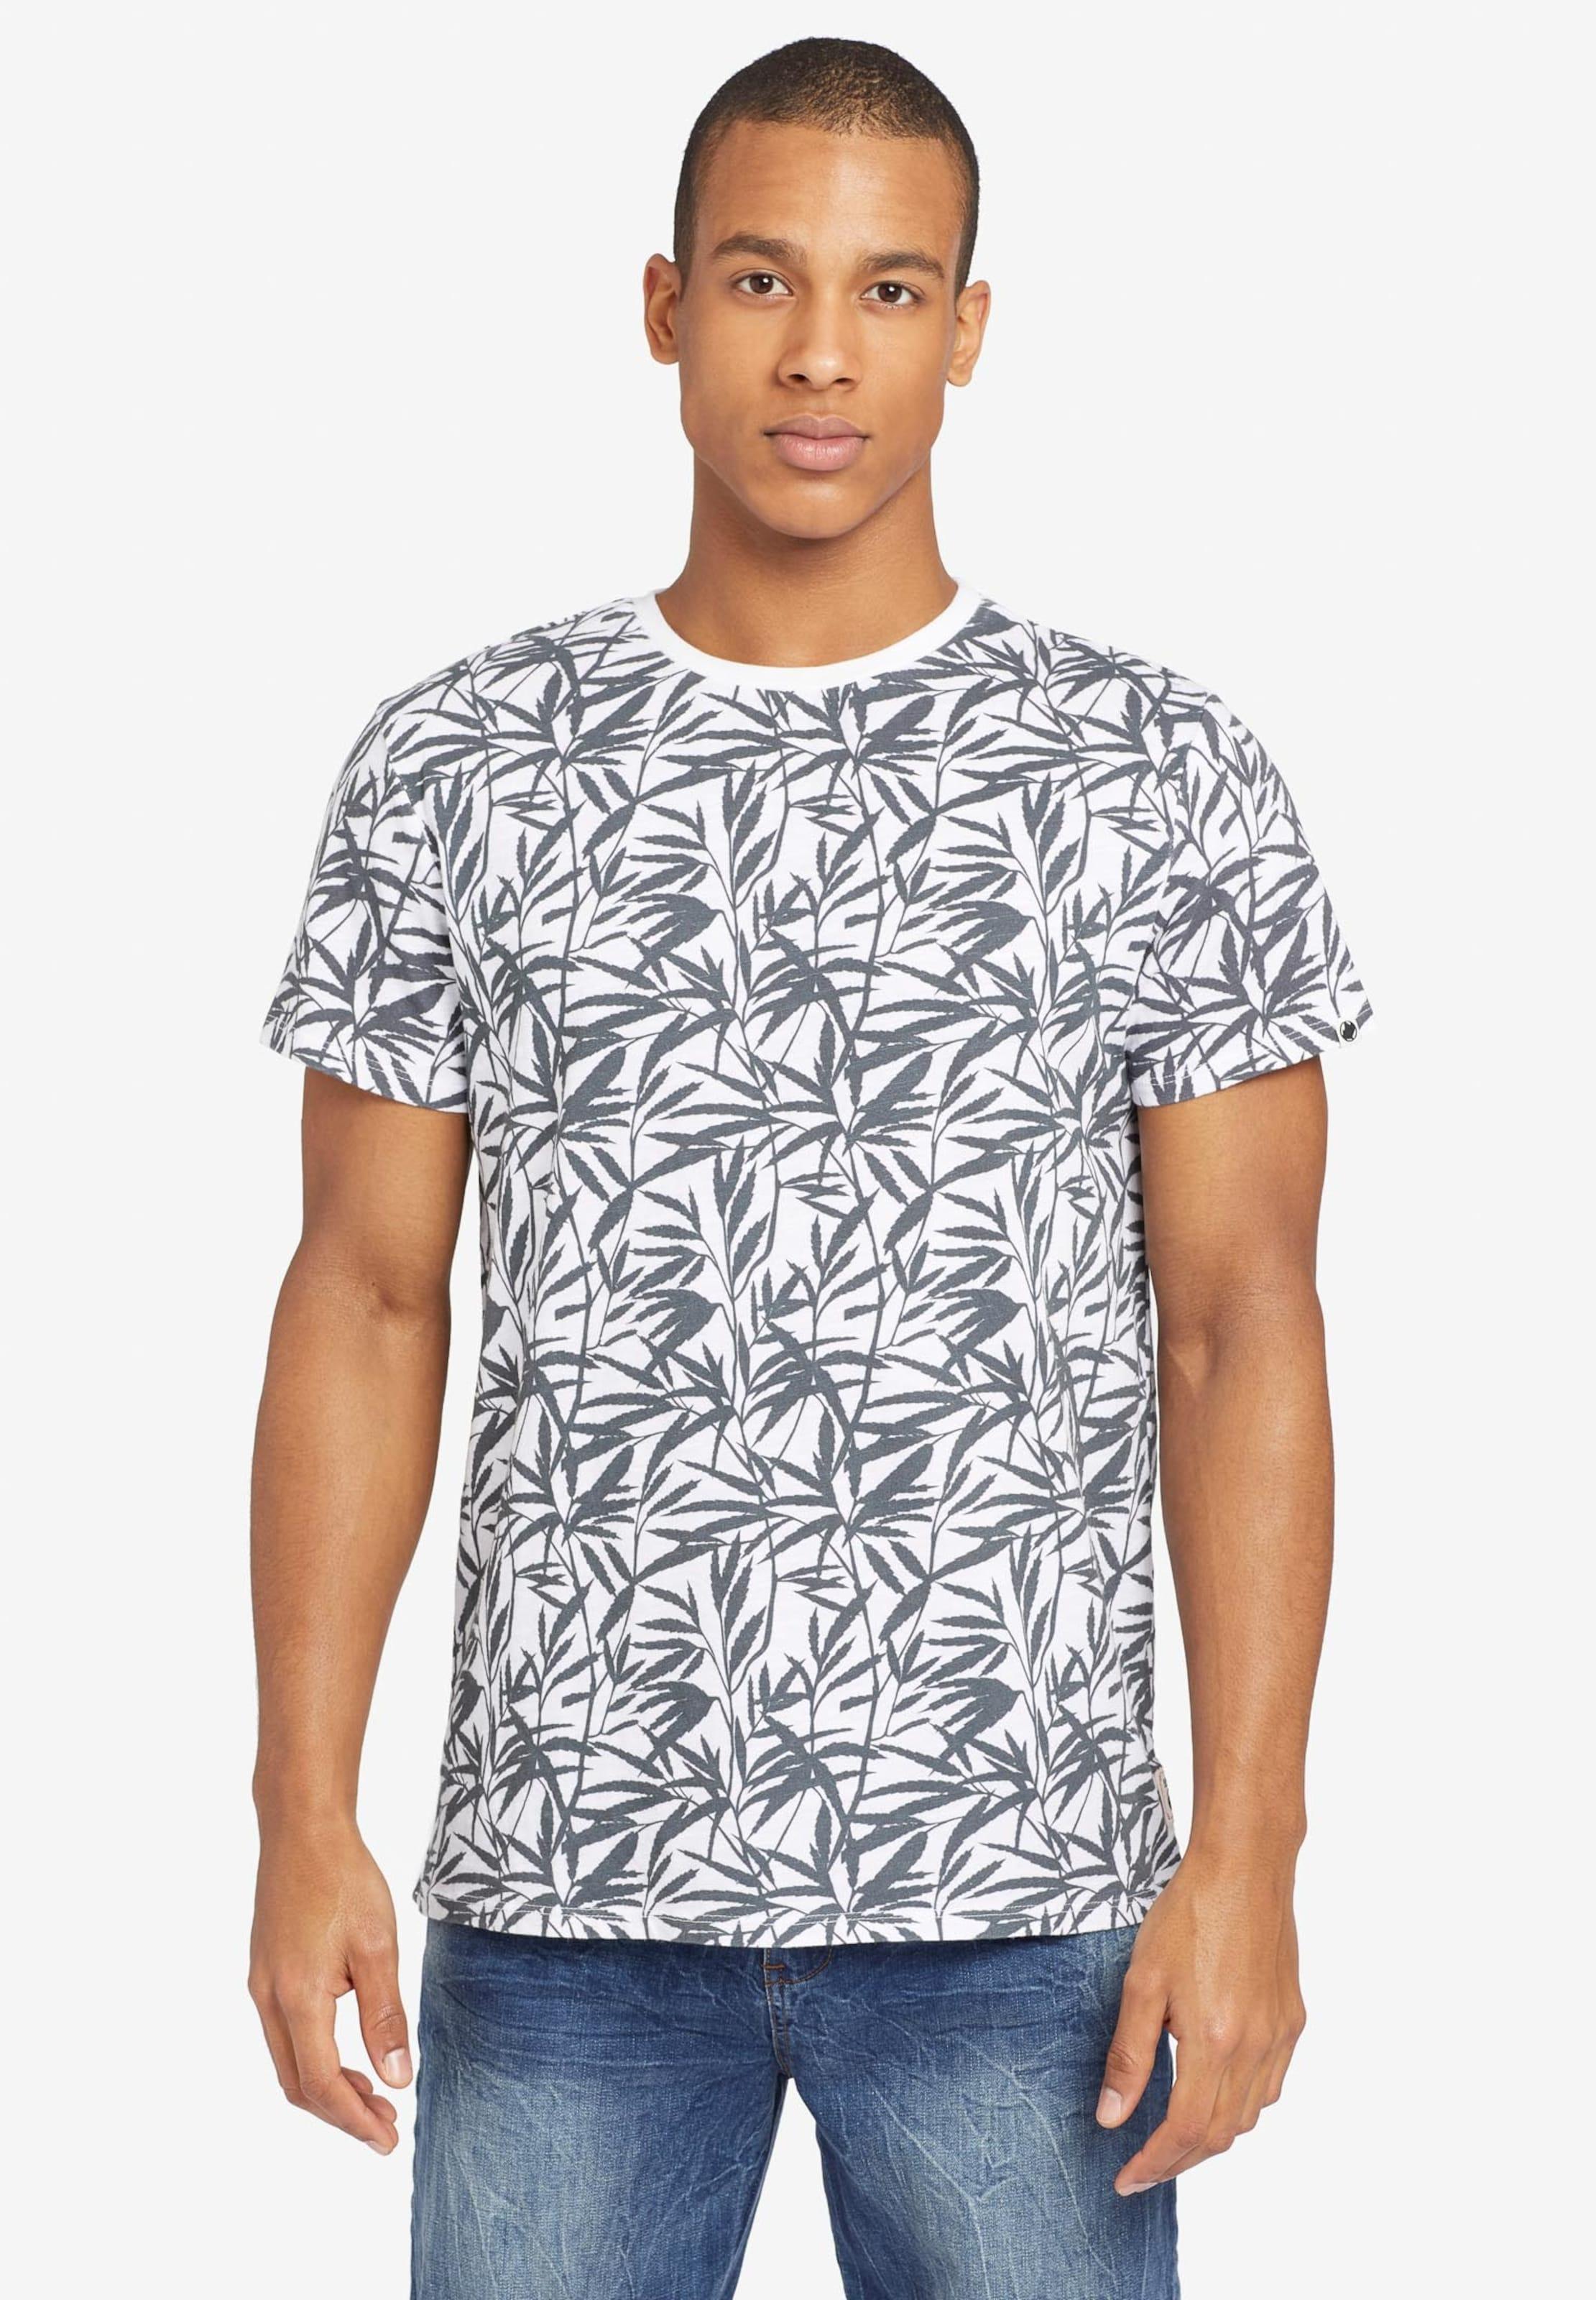 NoirBlanc shirt Leaf' T 'alberto En Khujo FJlc1K